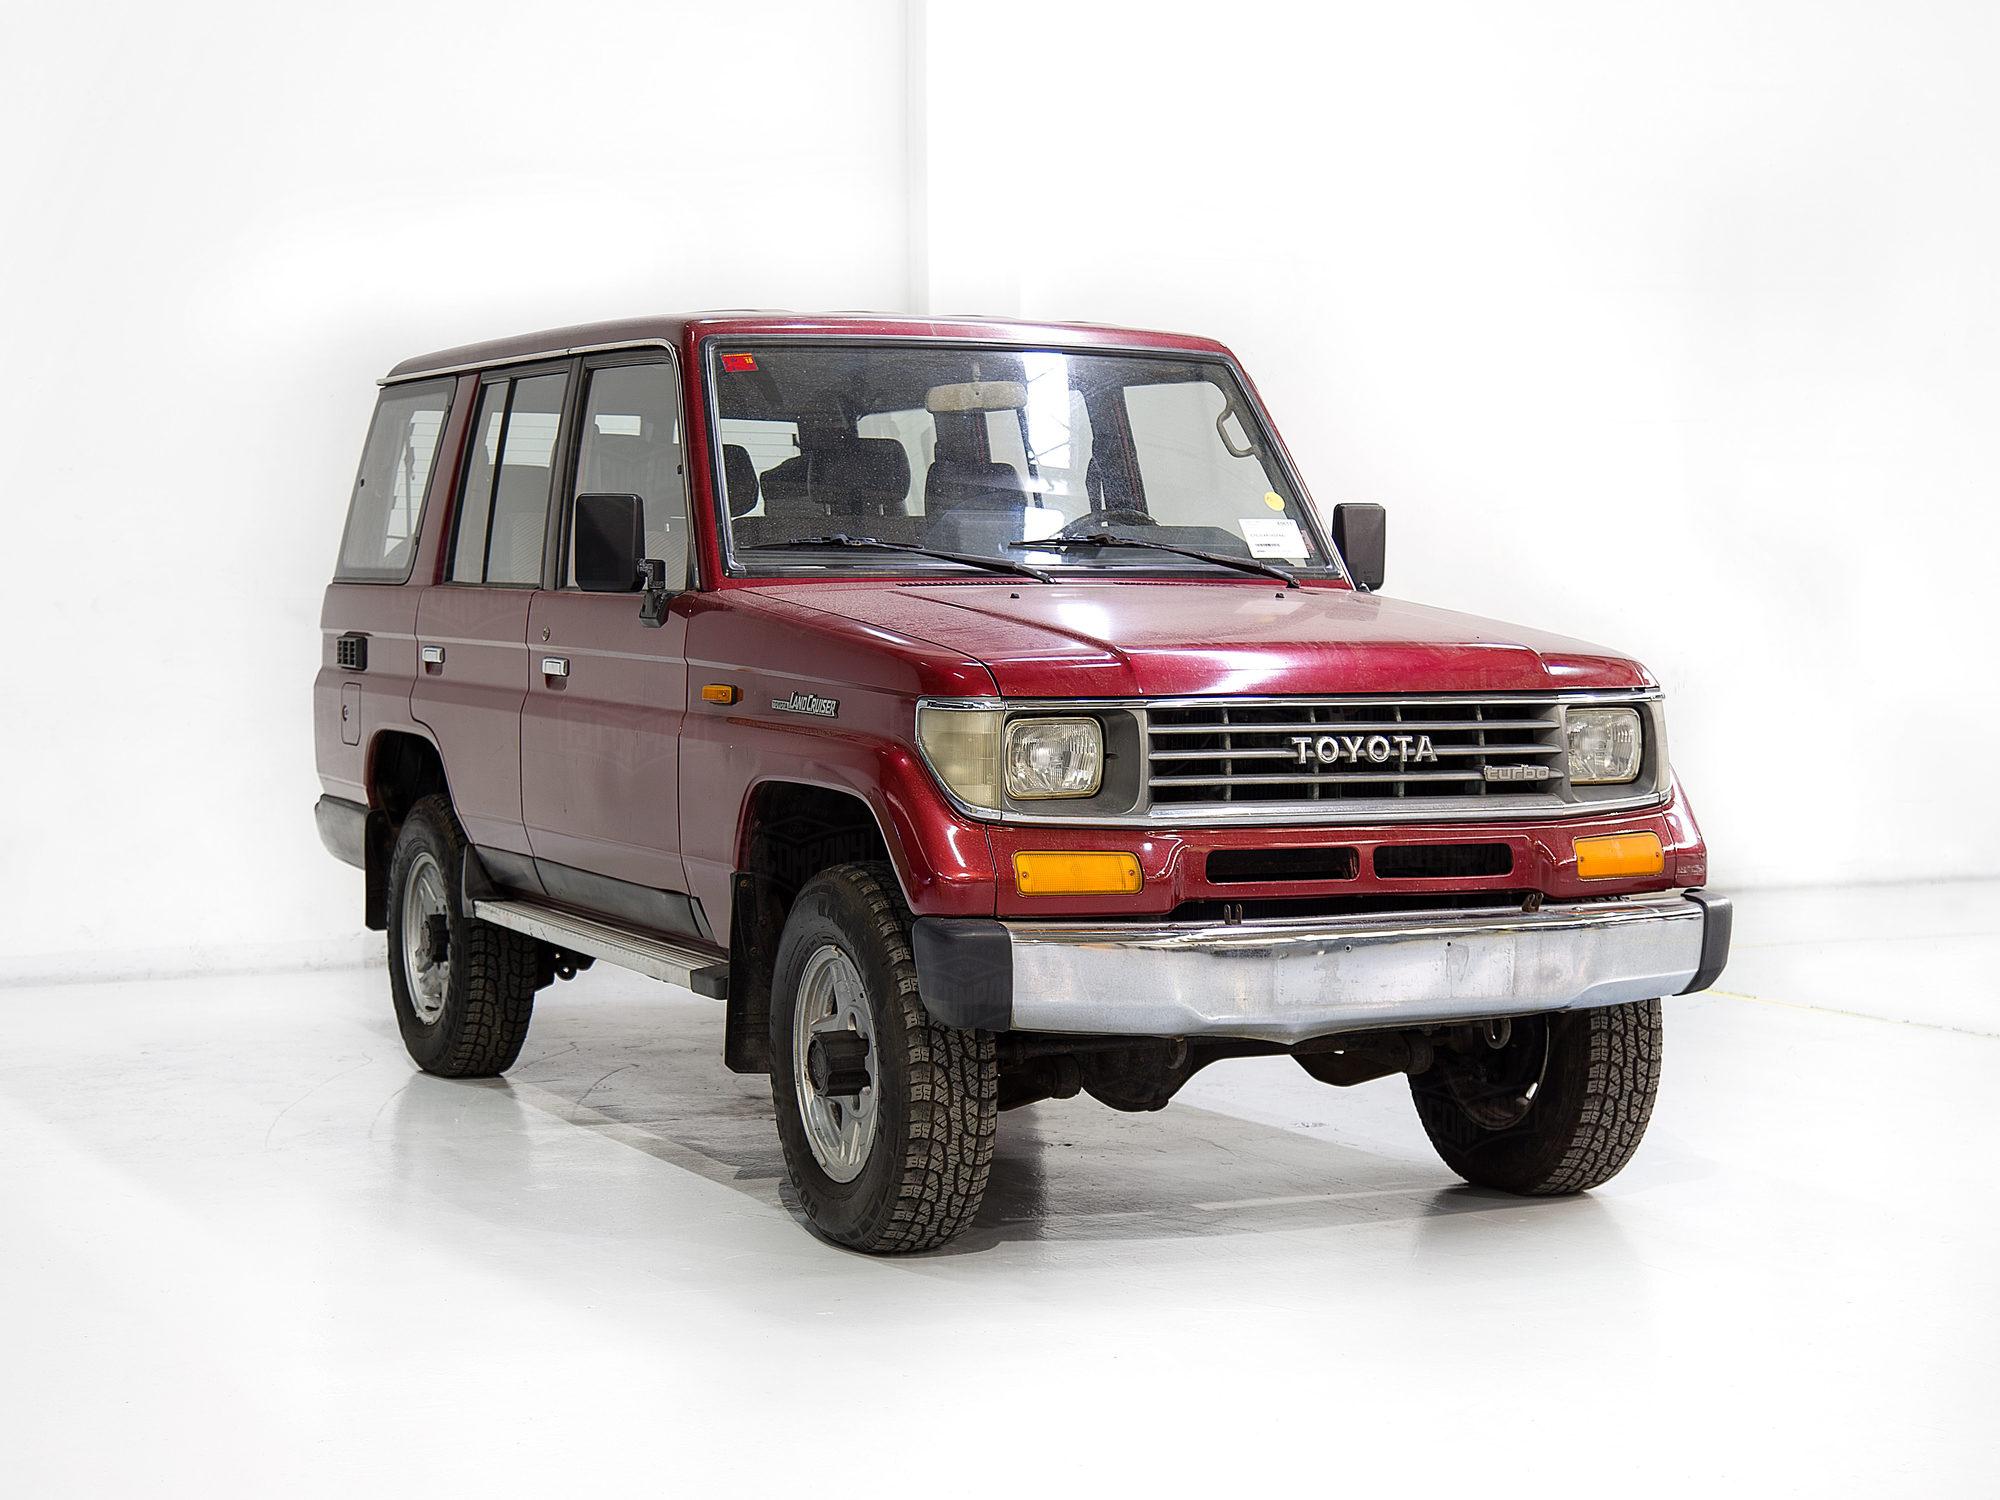 Toyota Dealer Miami >> 1990 FJ76 - Medium Red Pearl - JT1V0LJ7708000216